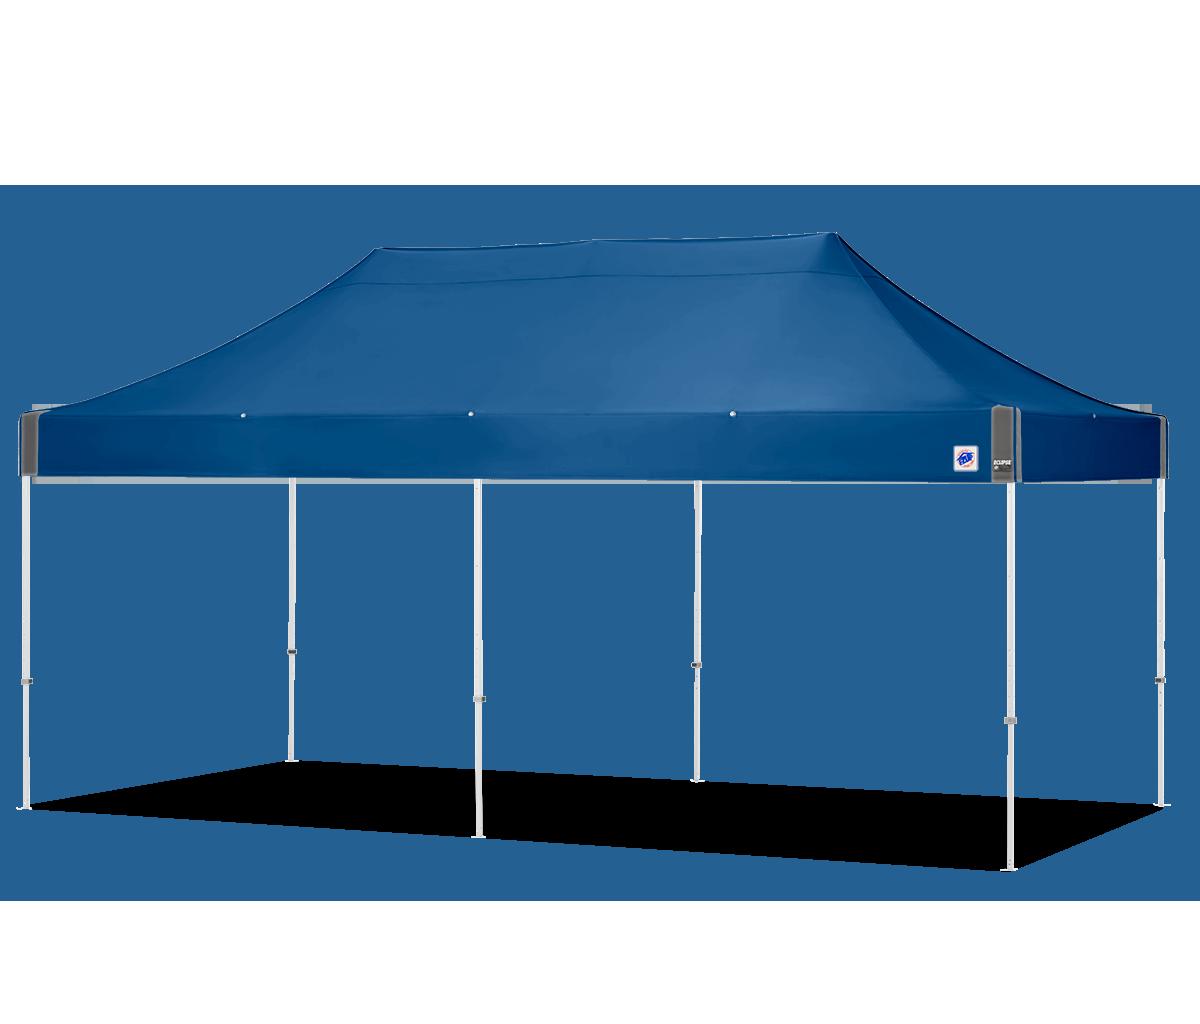 Eclipse Tente Pro - 3x6 (10'x20')